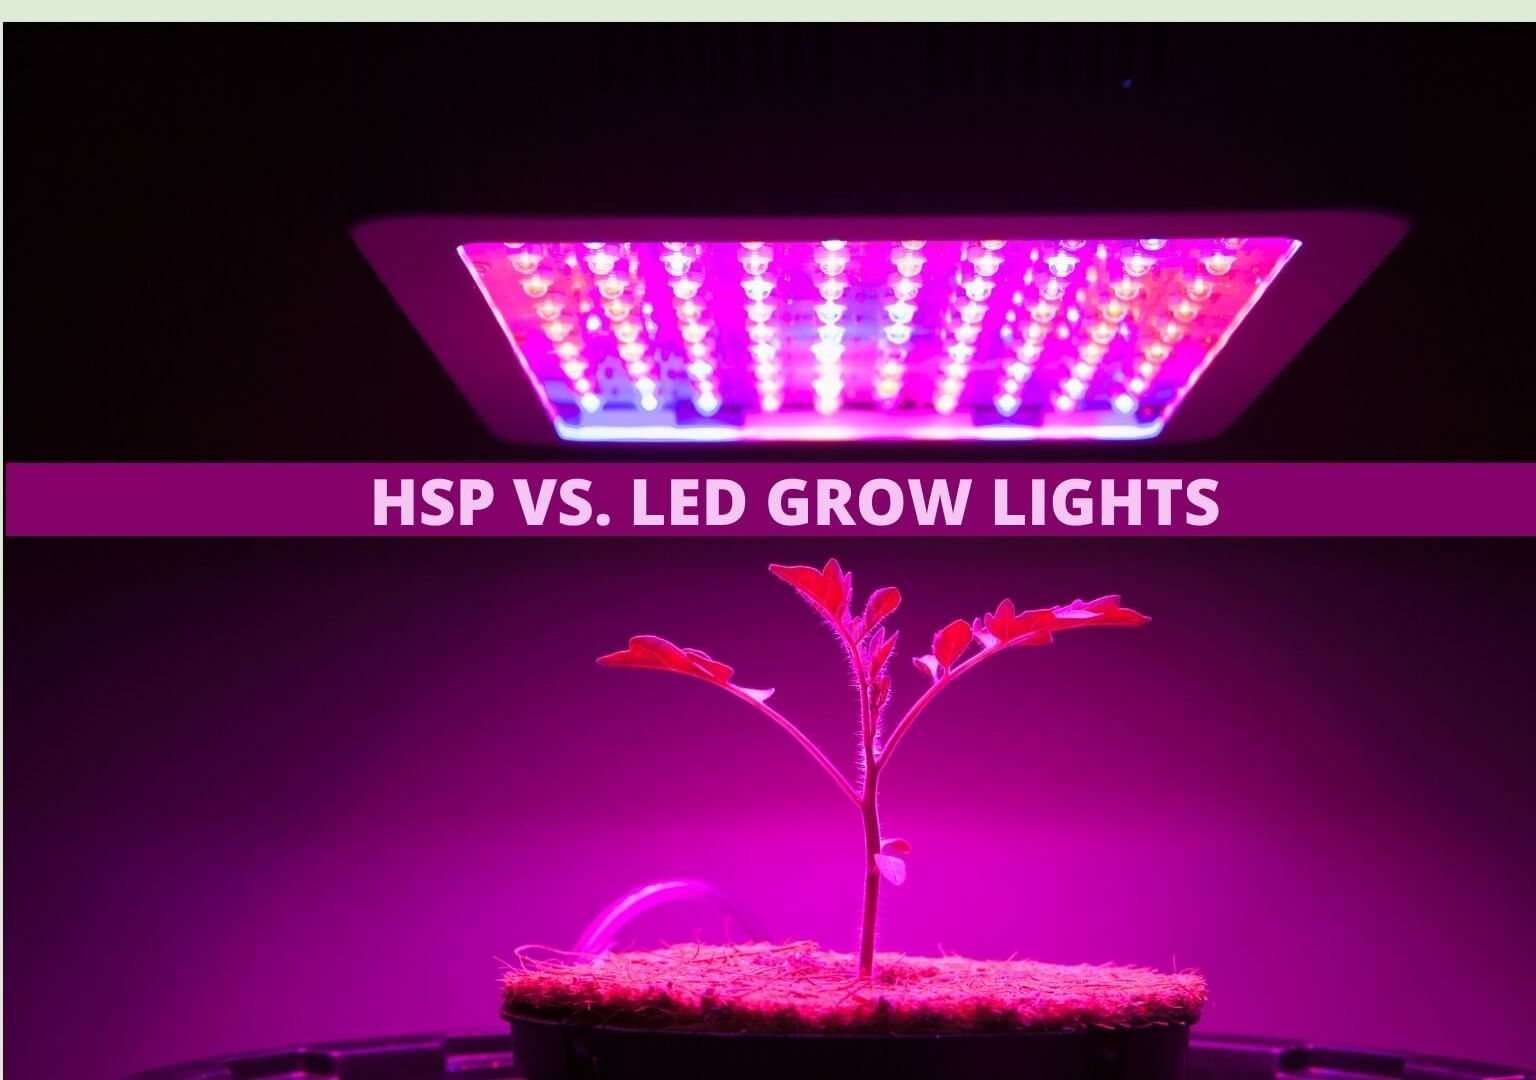 HSP vs. LED Grow Lights